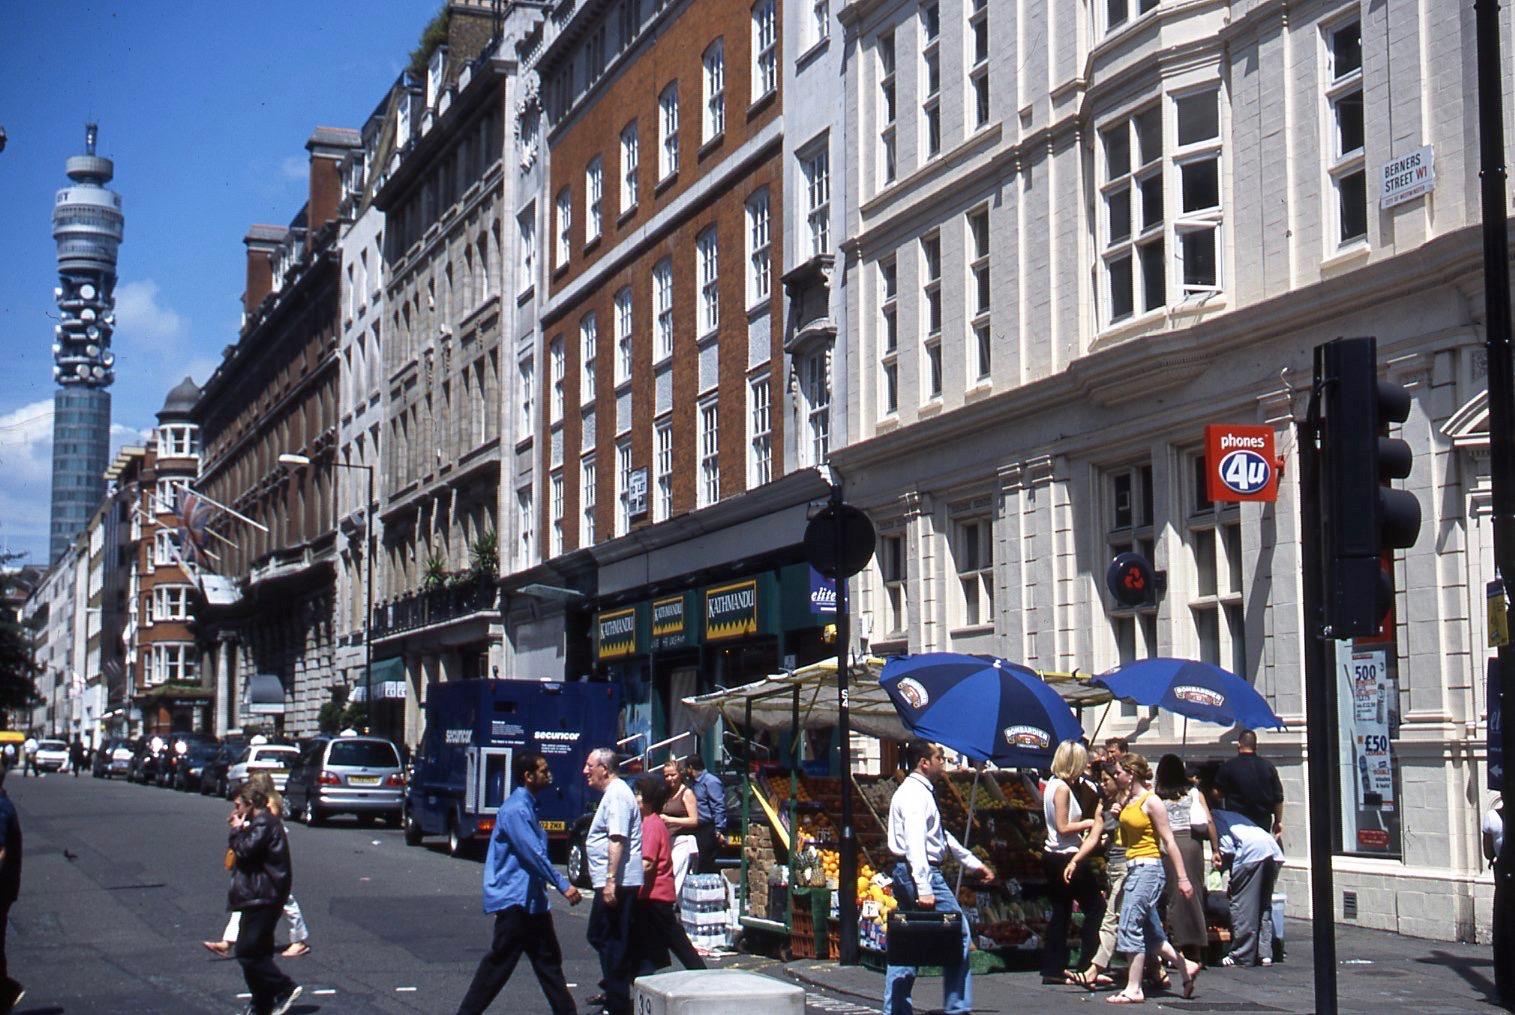 Berners Street W1